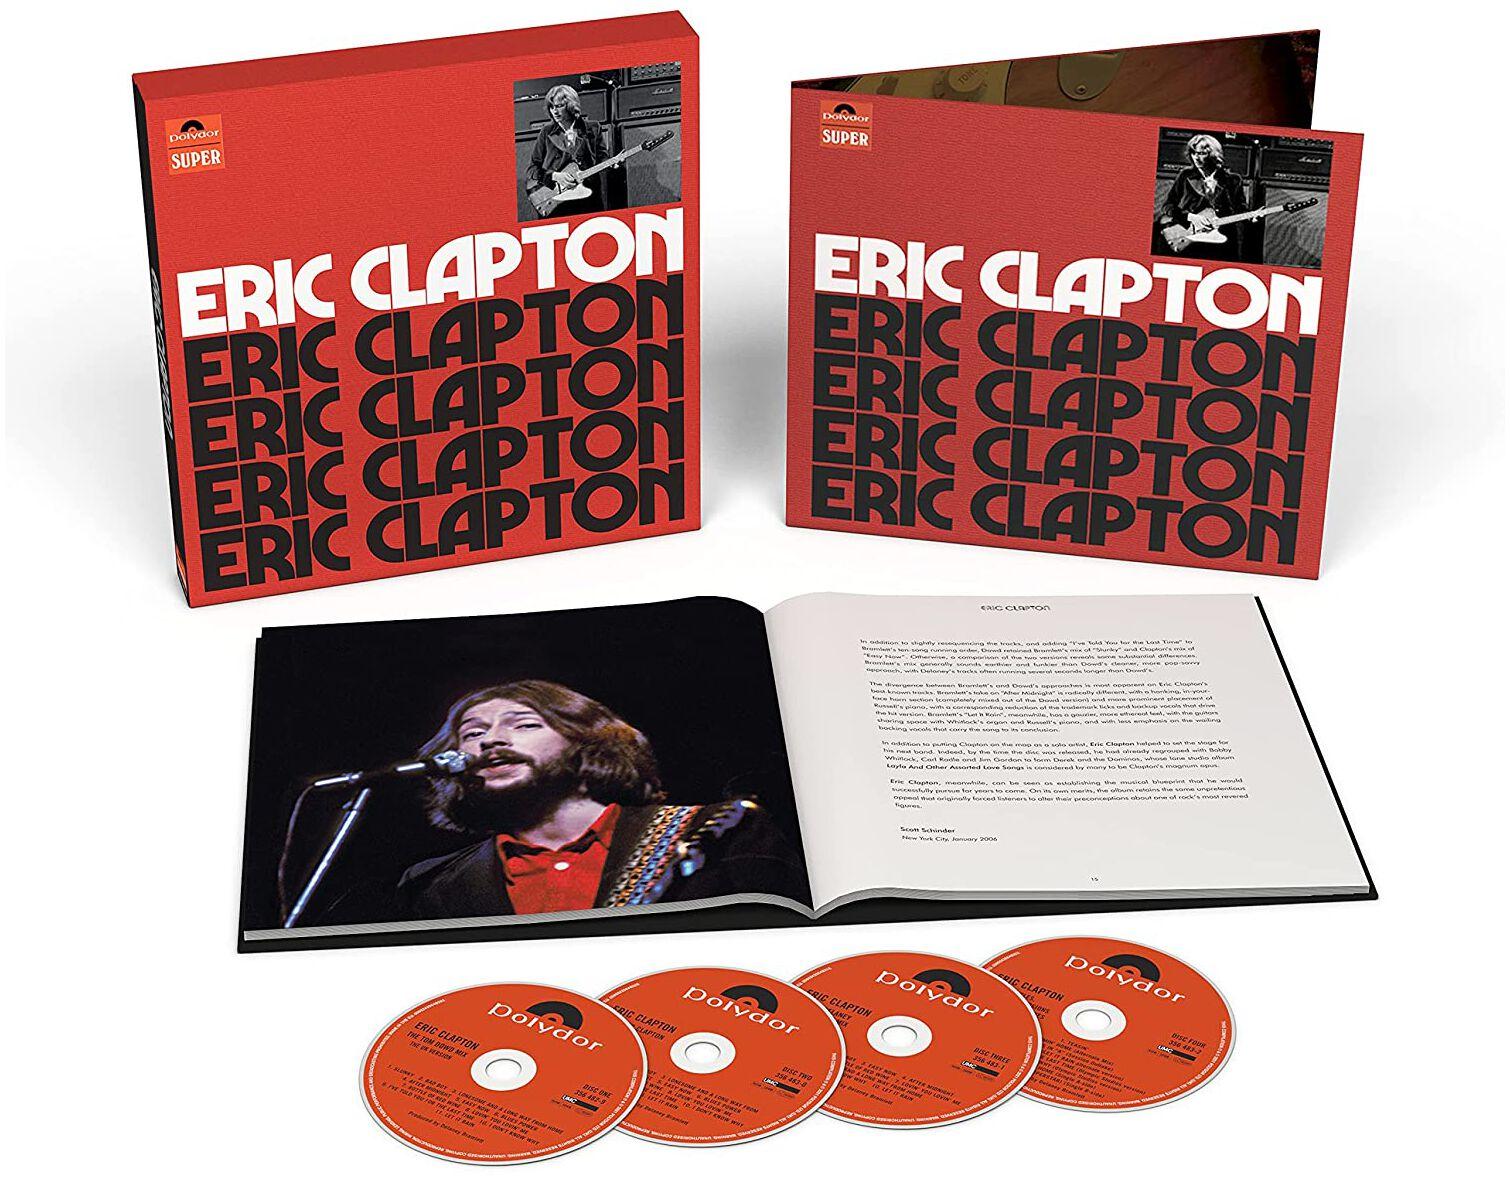 Image of Clapton, Eric Eric clapton 4-CD Standard